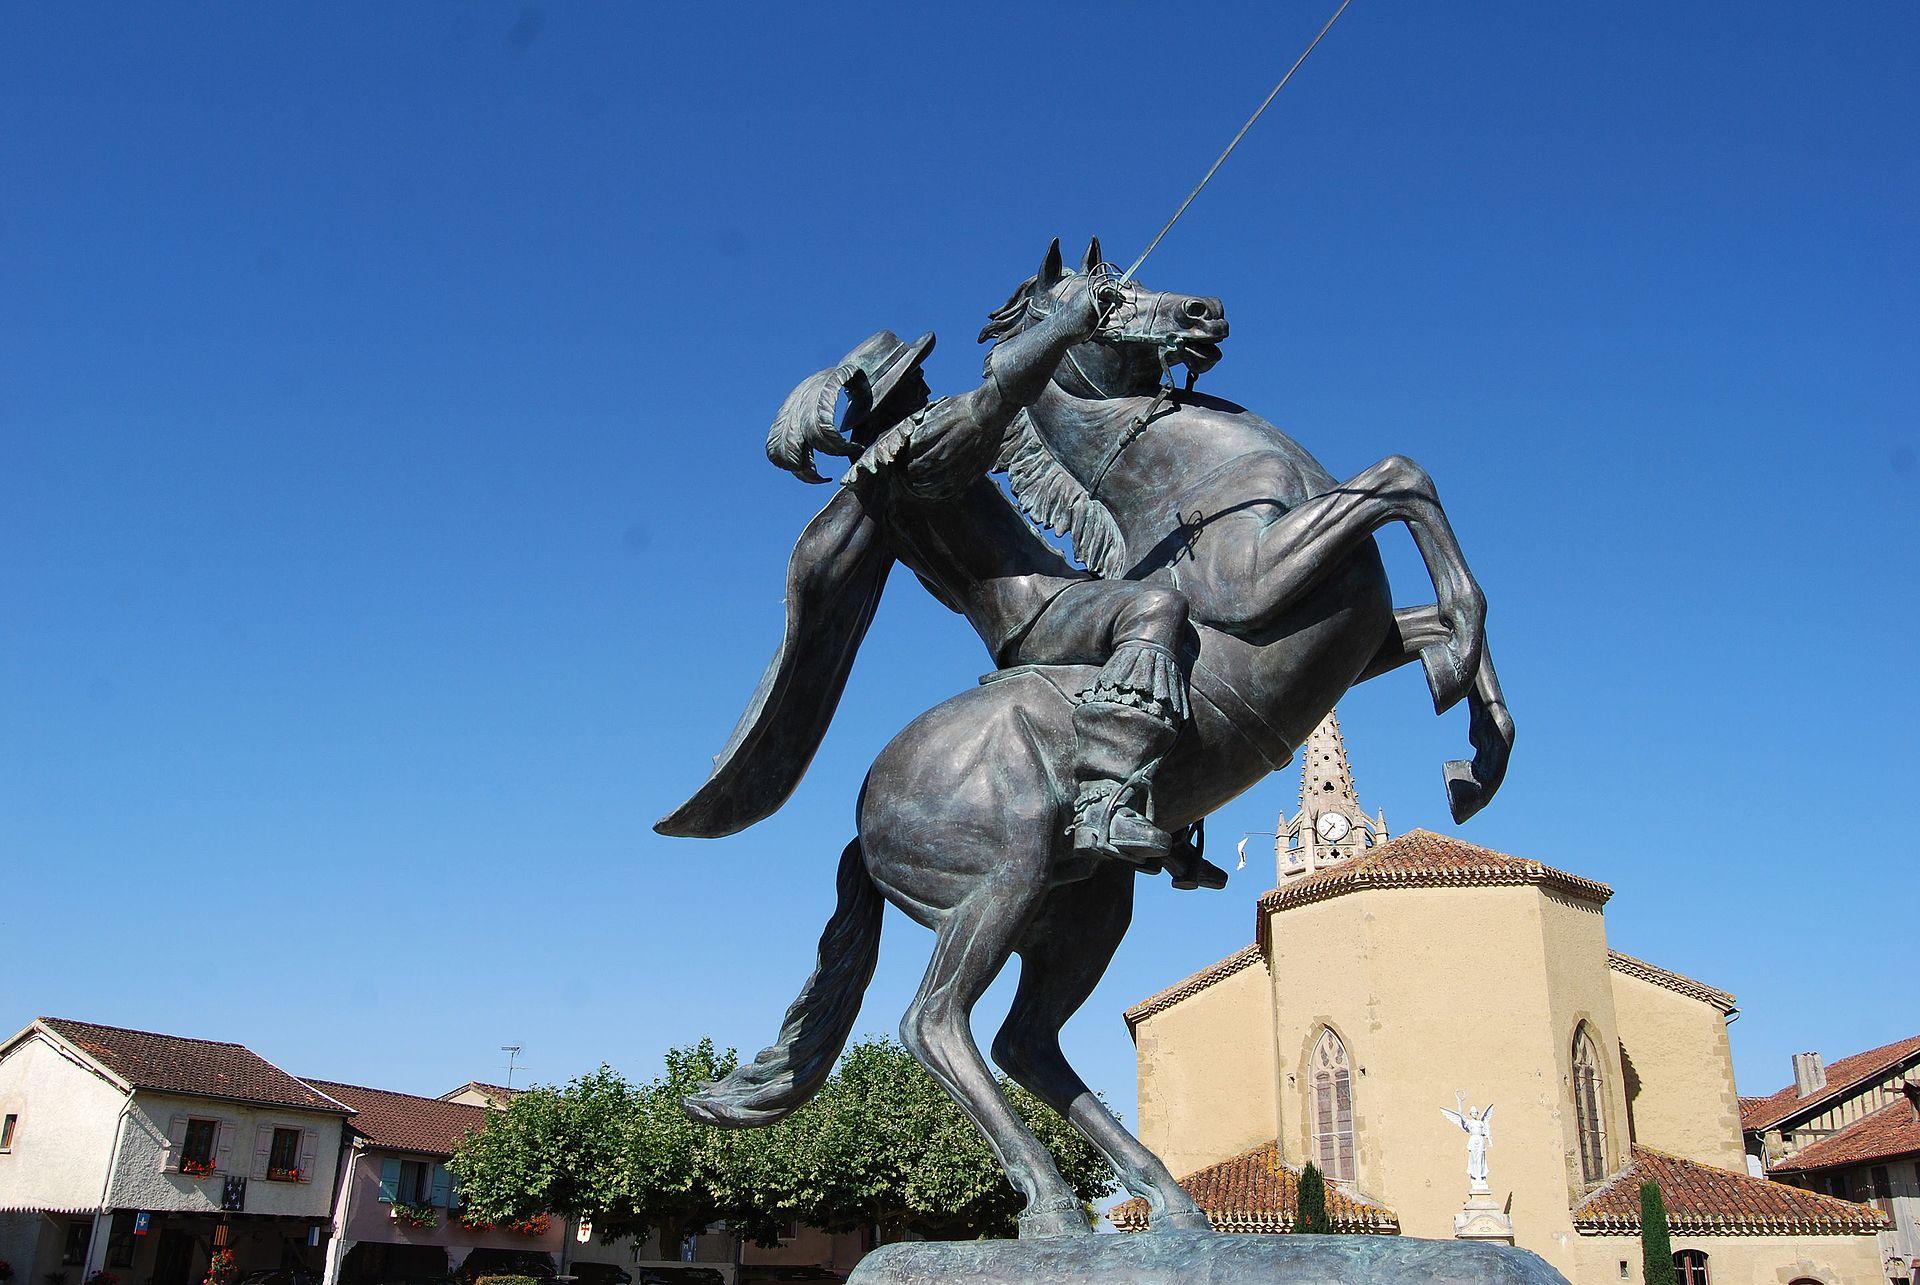 Equestrian statue of d'Artagnan, 2015, Daphné Du Barry, Lupiac, France